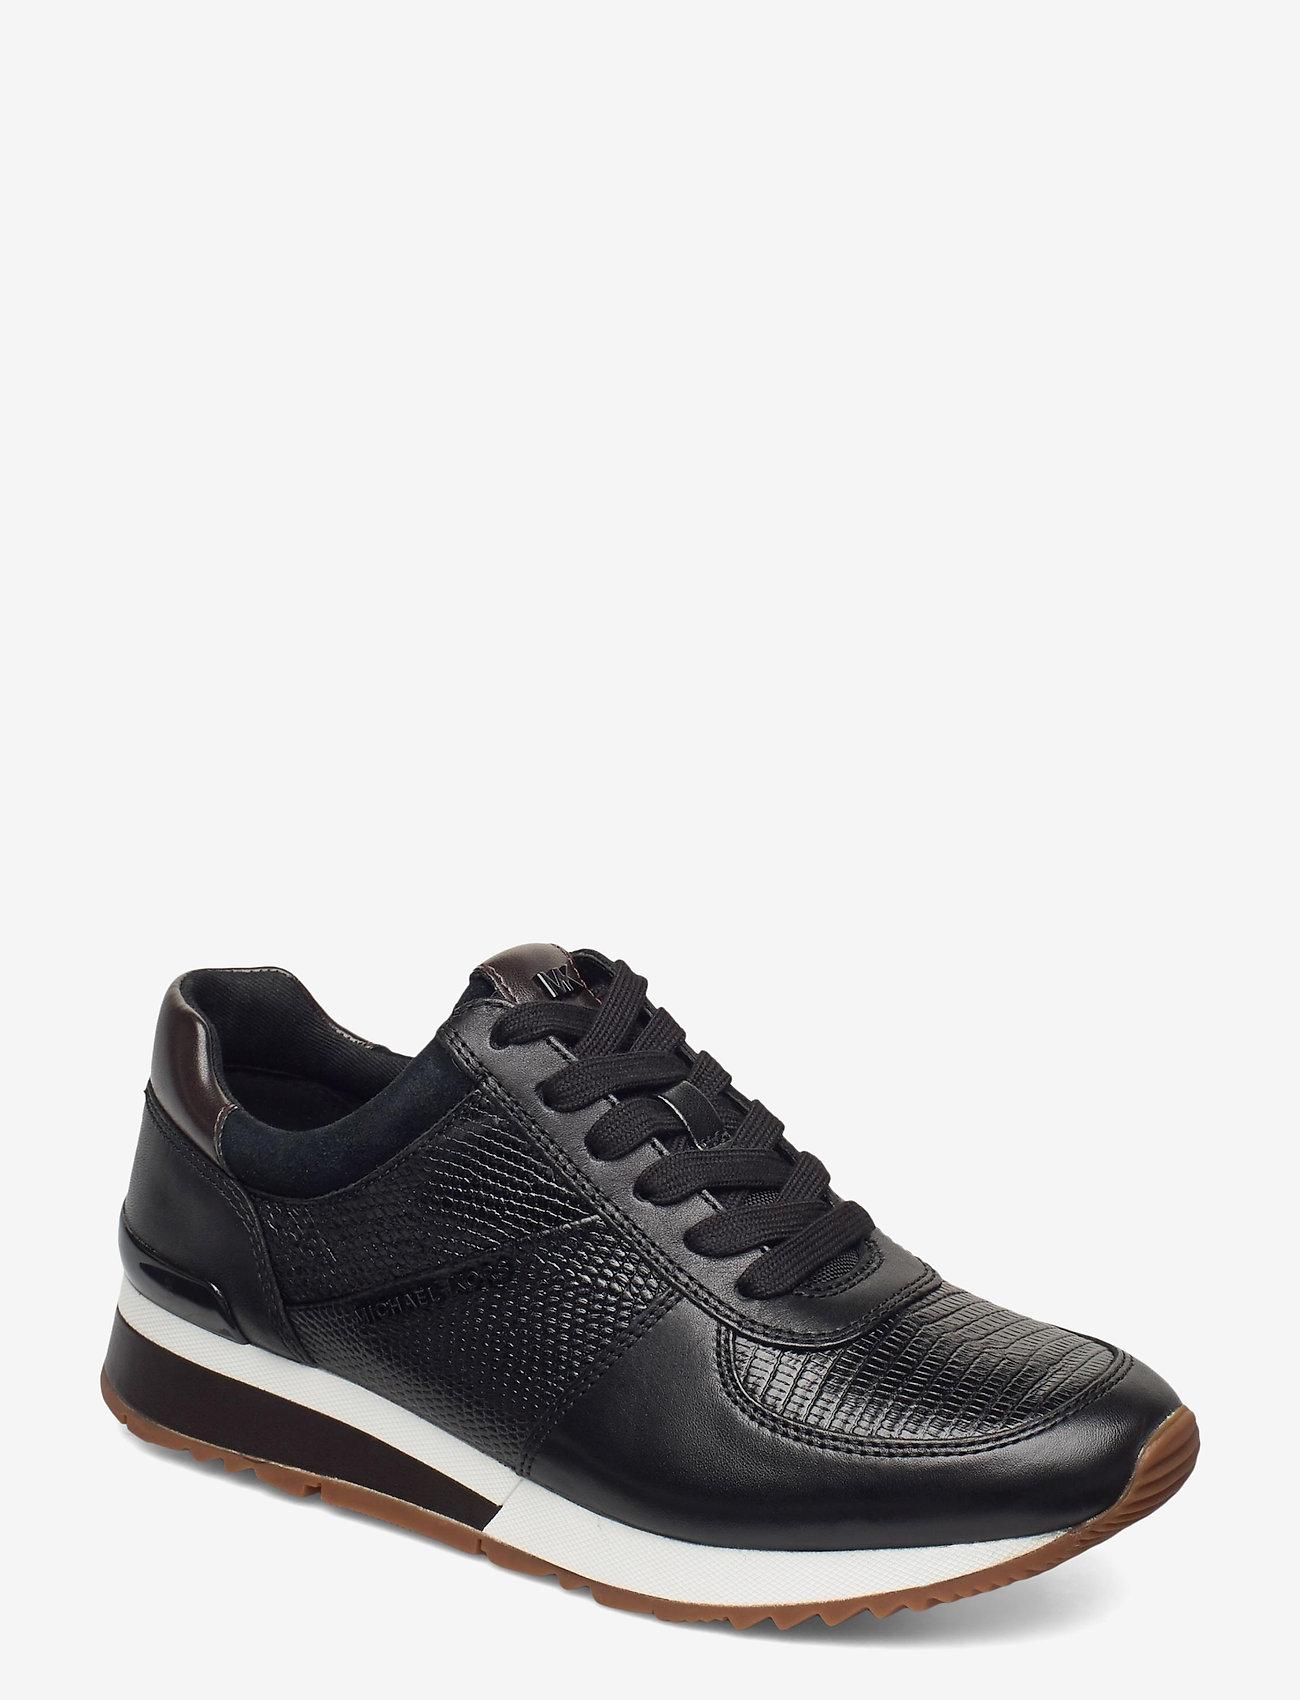 Michael Kors Shoes - ALLIE WRAP TRAINER - lage sneakers - black - 0